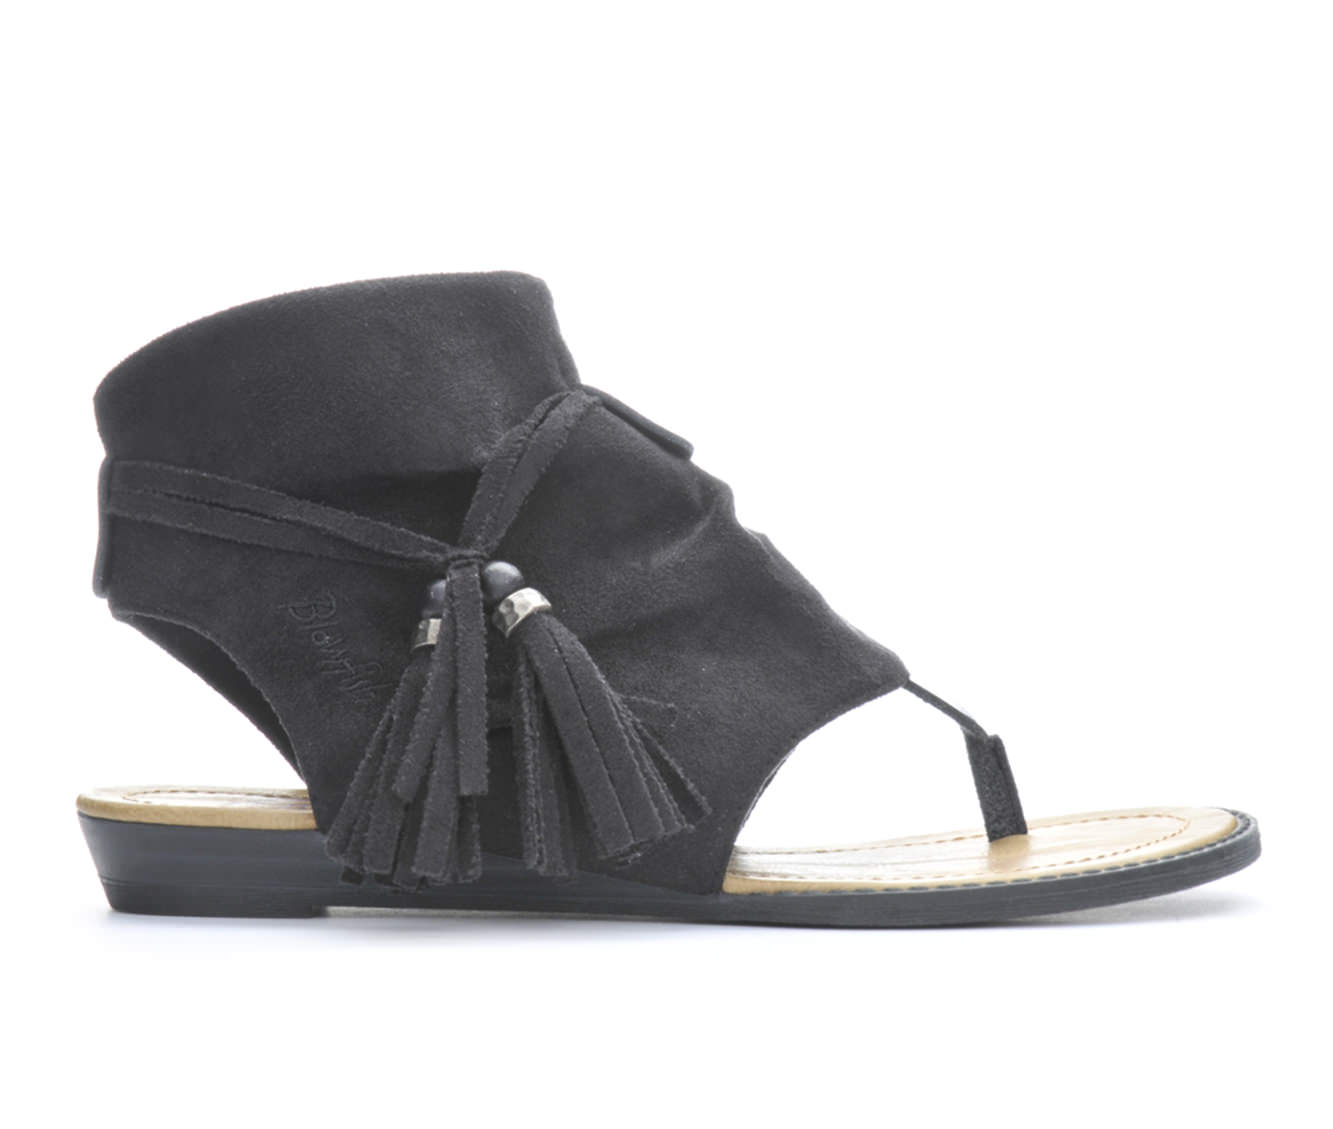 Women's Blowfish Malibu Brueke Sandals (Black)